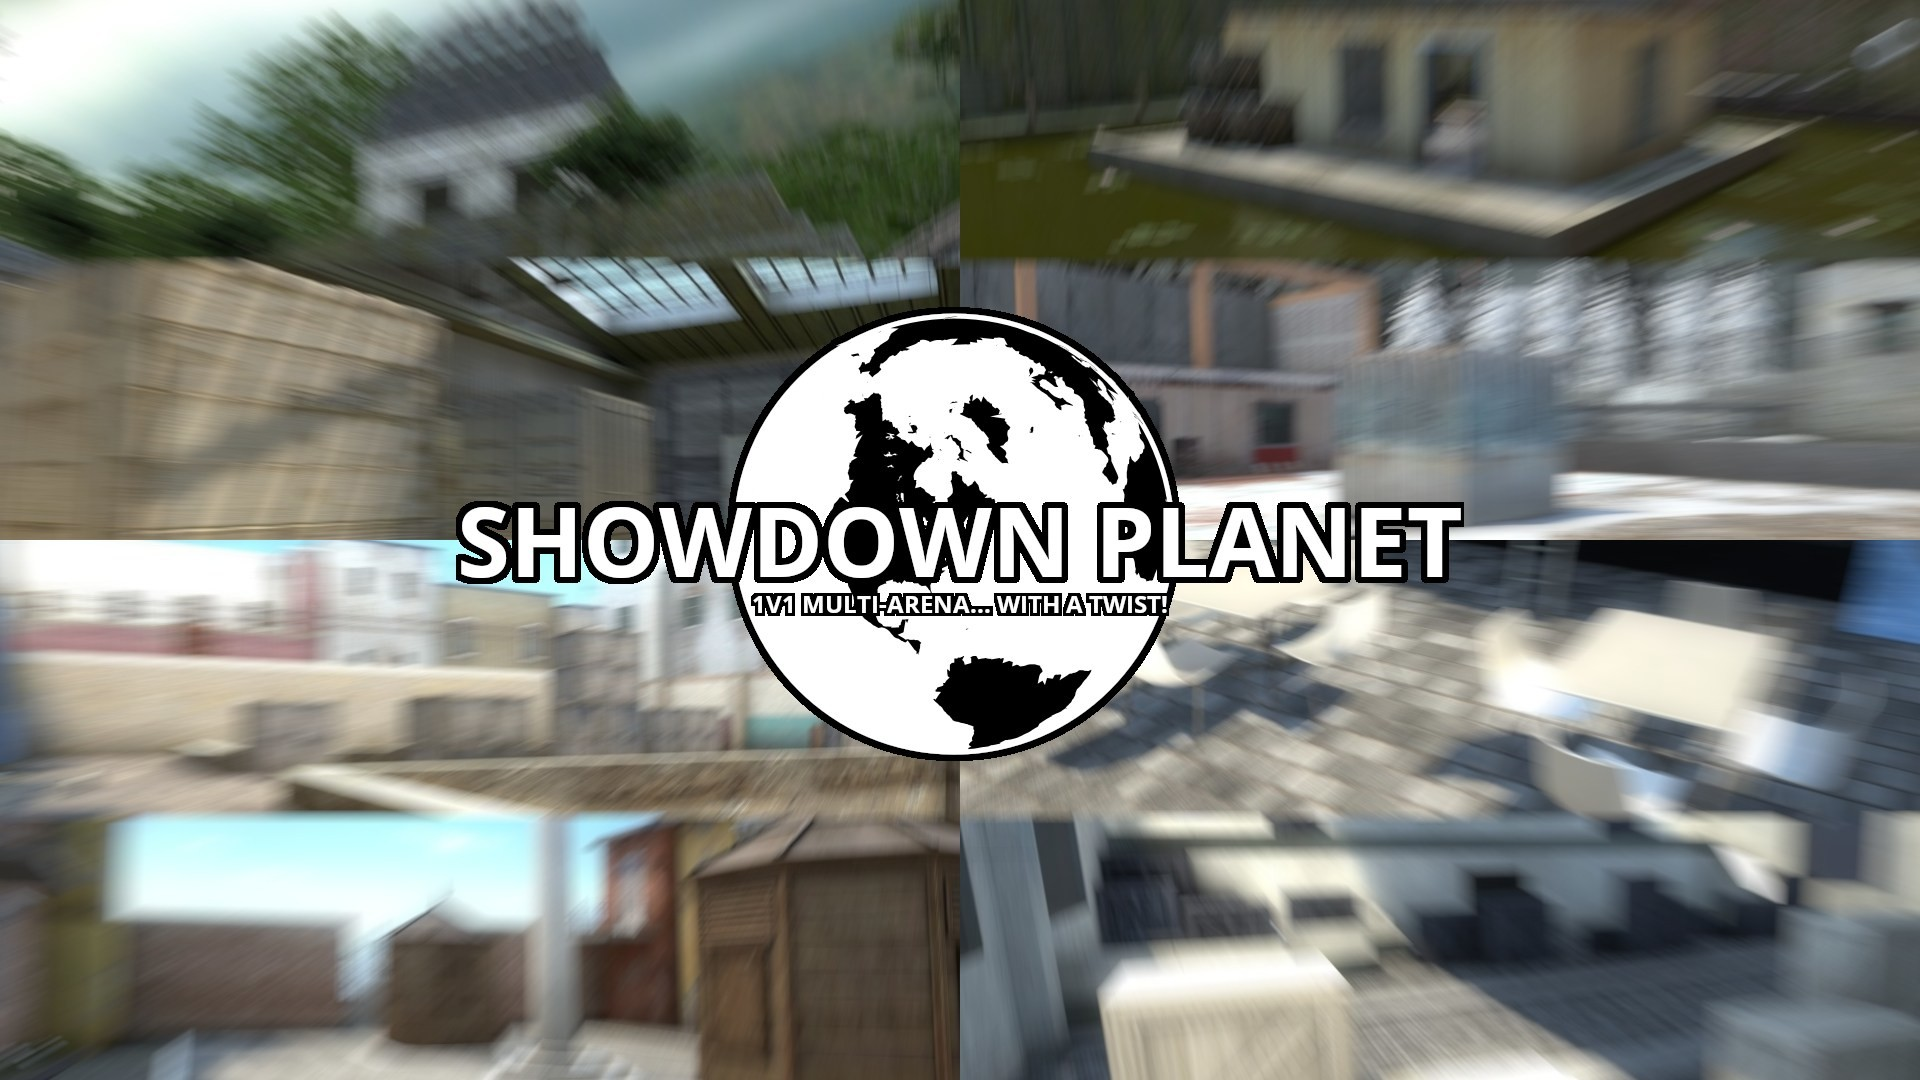 800521868_aim_showdown_planet_thumbcompressed.jpg.d54991f875f041022227a40075e86004.jpg